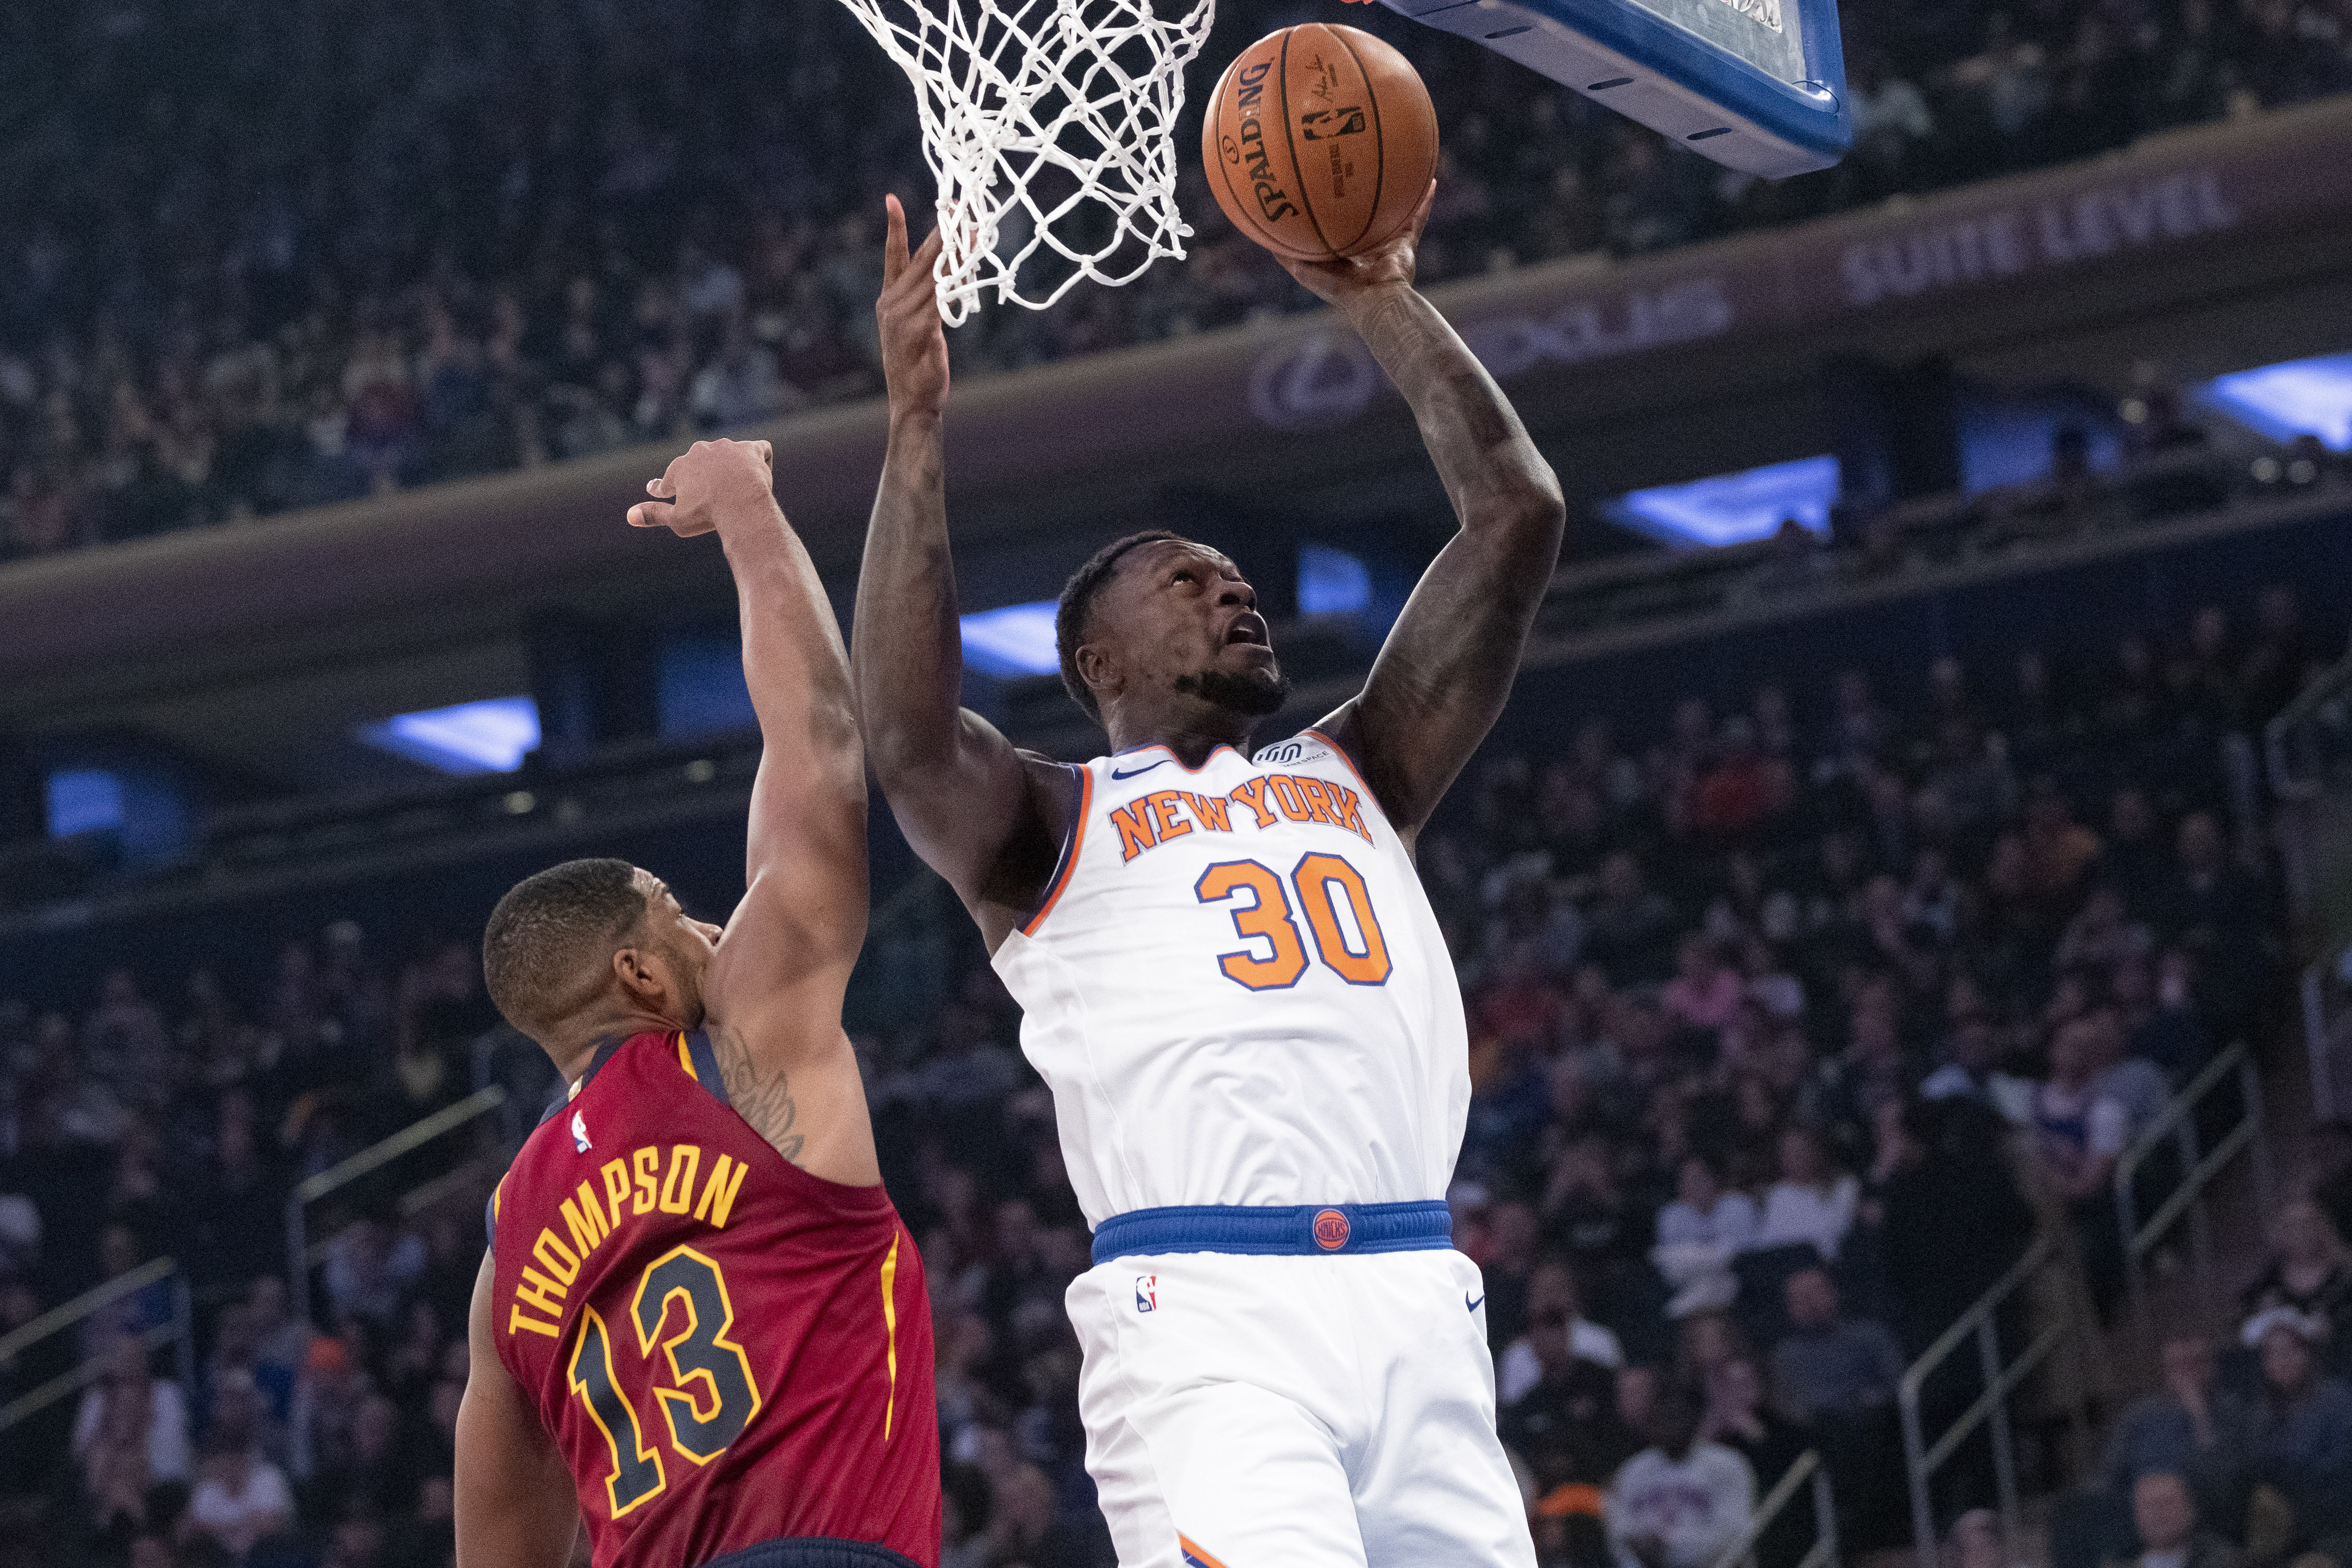 Sexton scores 31, Cavaliers beat Knicks 108-87